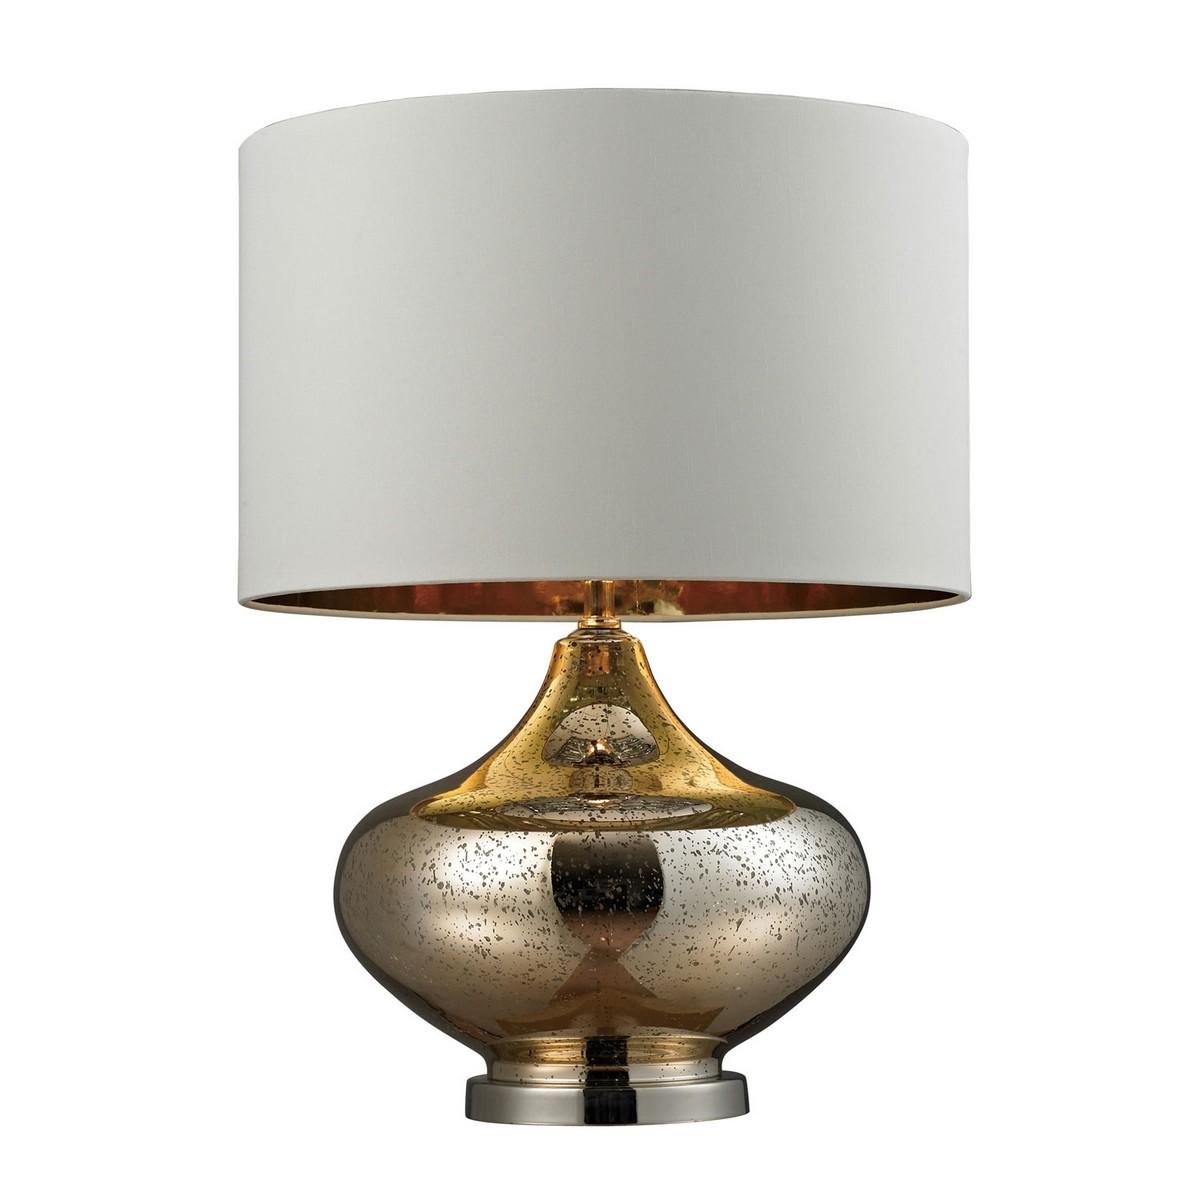 Elk Lighting D269 Table Lamp - Gold Mercury Glass, Polished Nickel